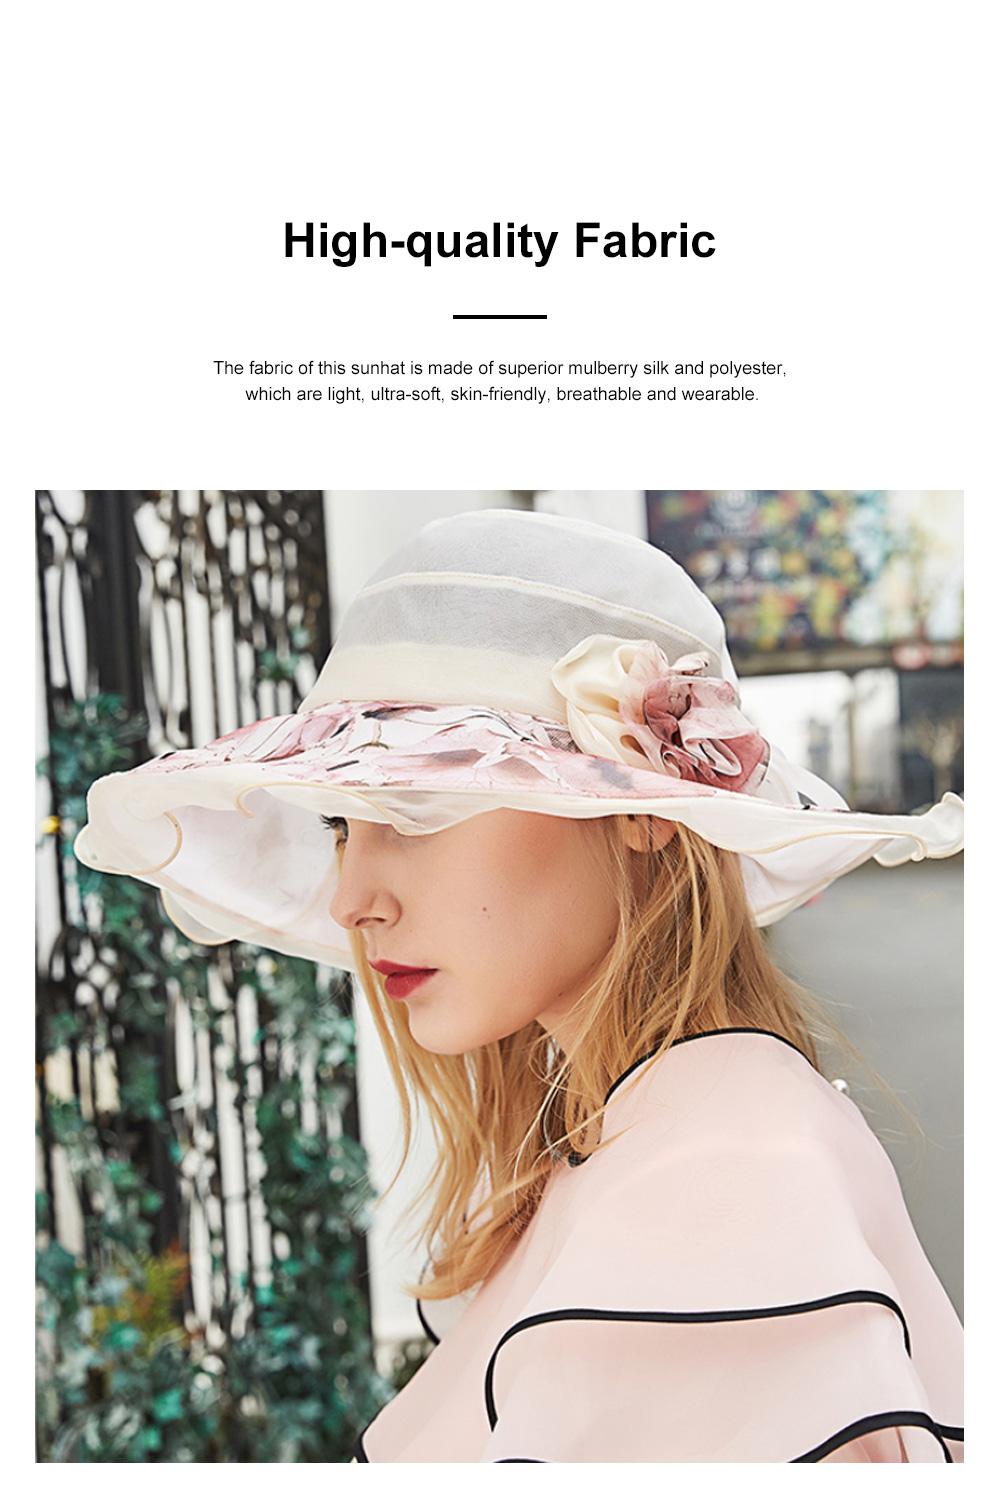 Minimalist Stylish Atmosphere Stereo Flower Model Decorative Foldable Lady Sun Bonnet Hat with Large Brim Wind Rope 3